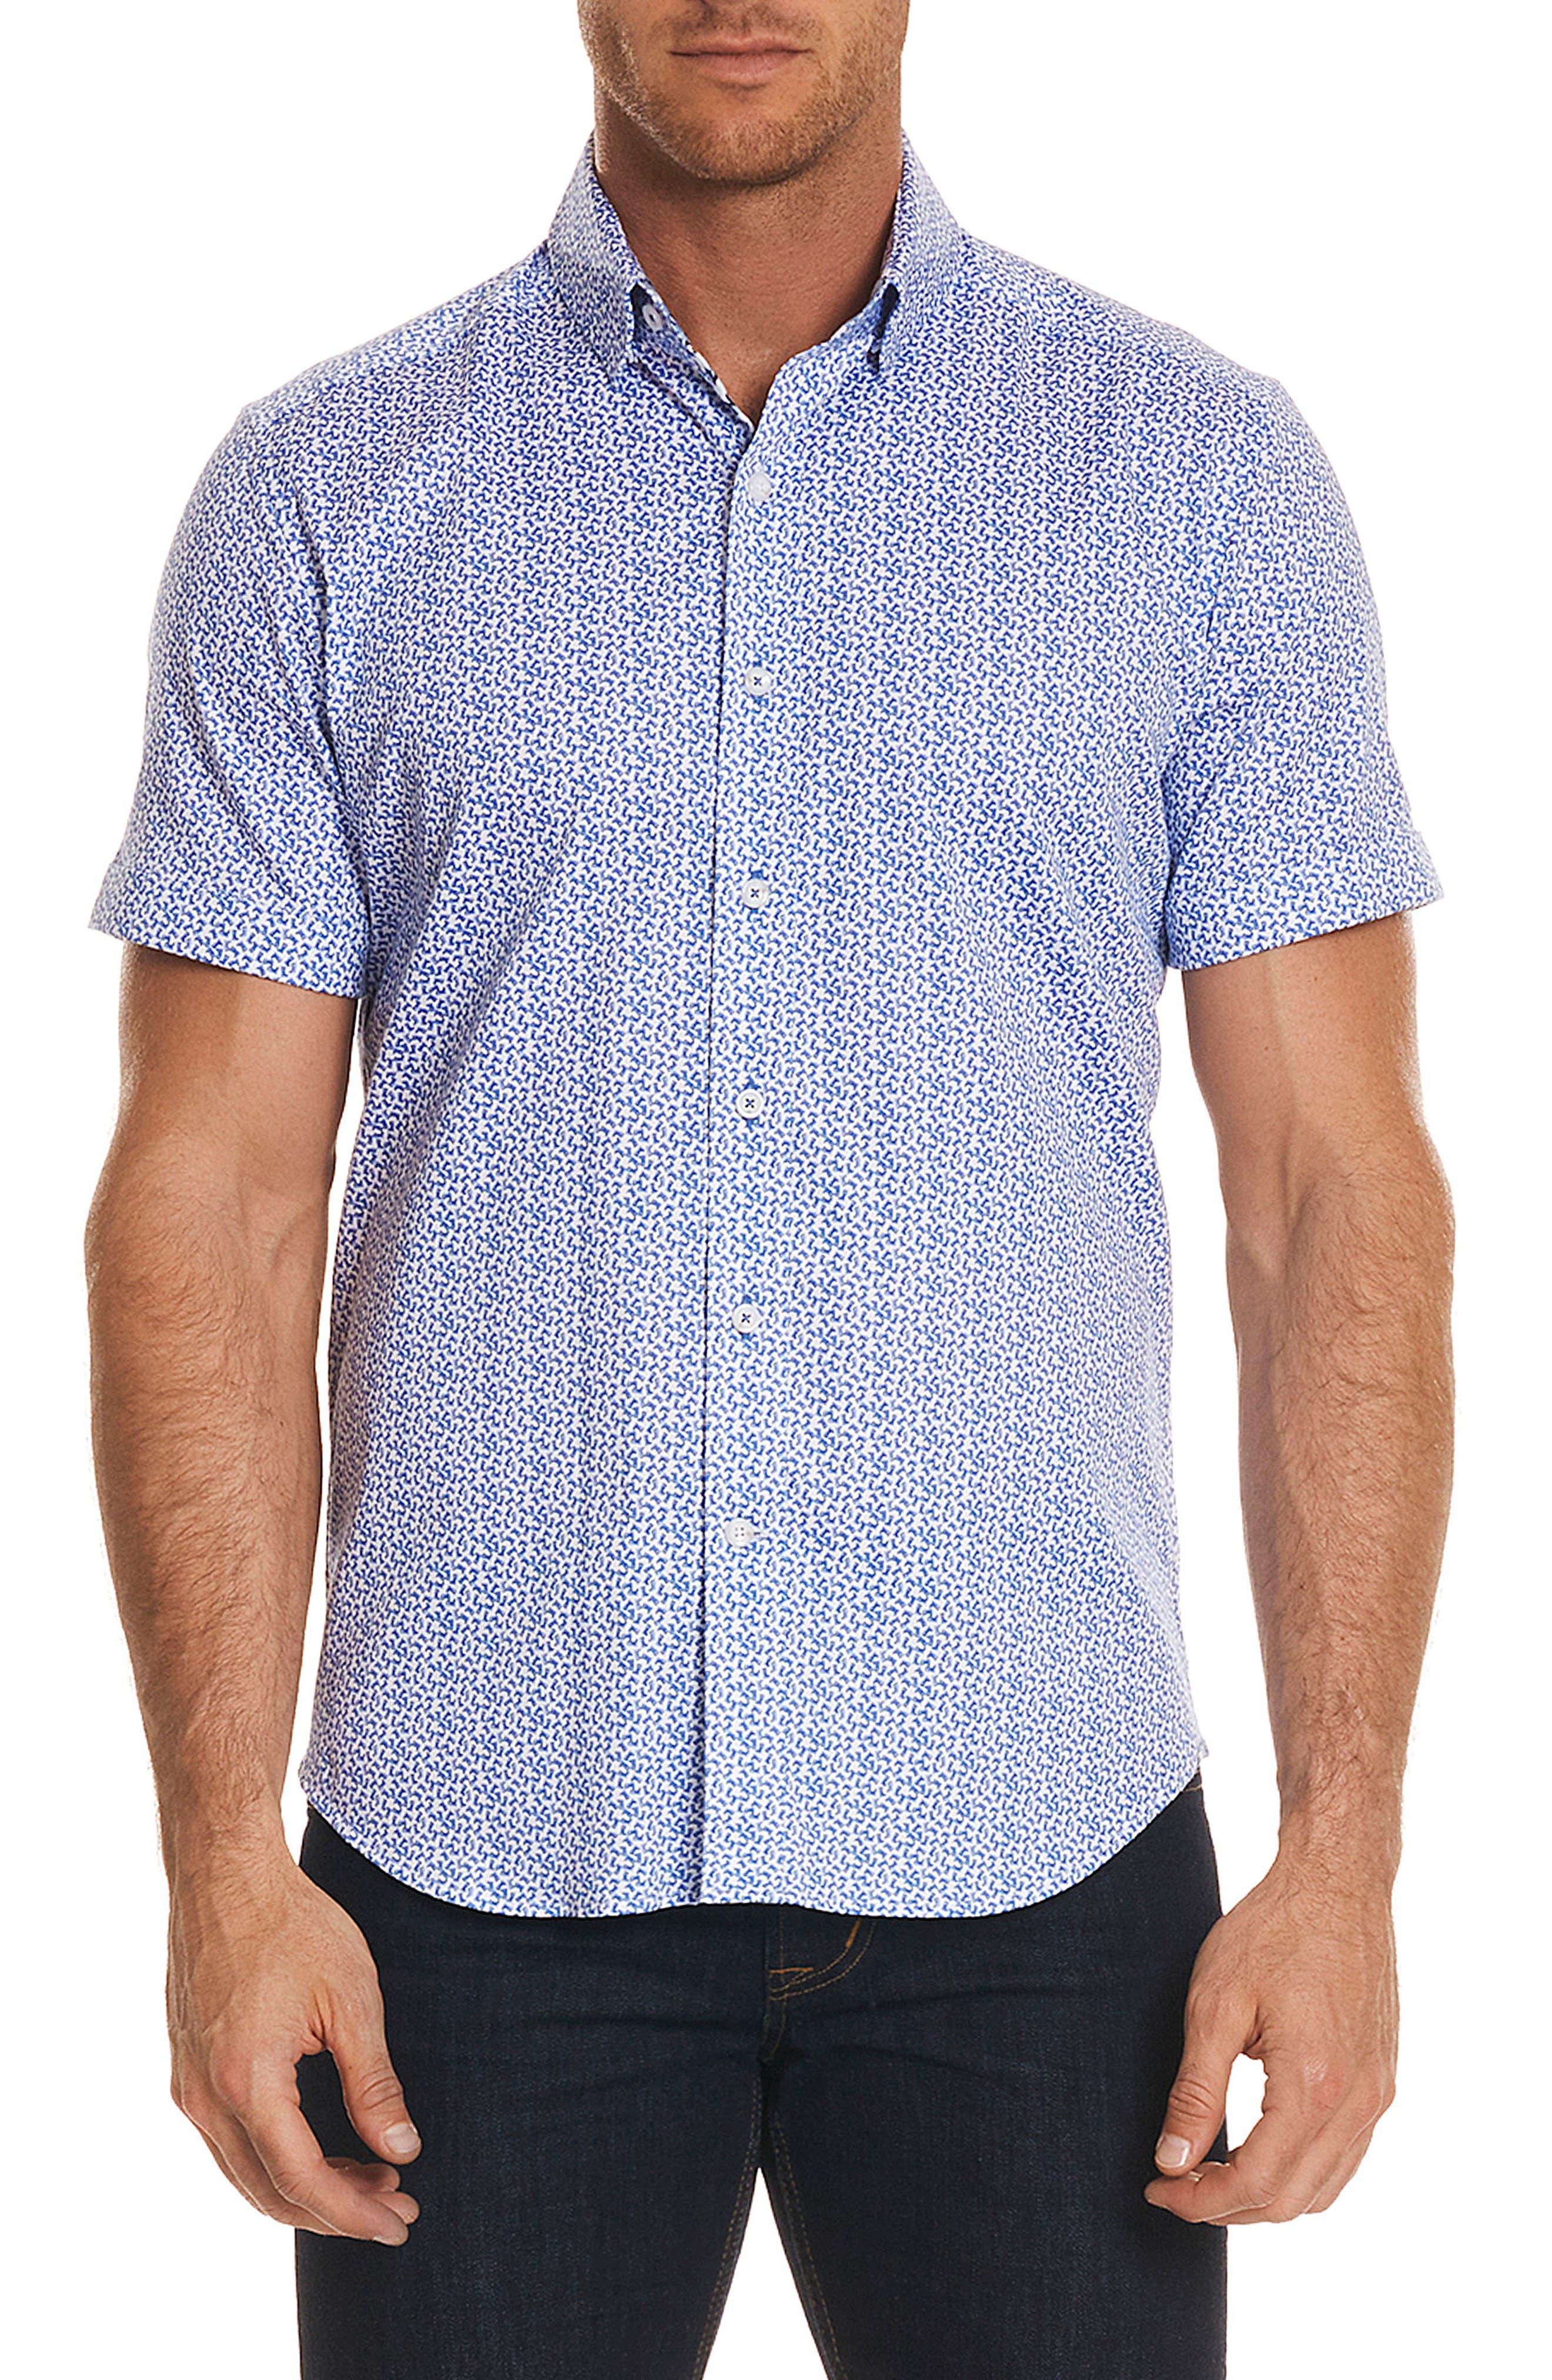 Hartman Tailored Fit Sport Shirt,                             Main thumbnail 1, color,                             400